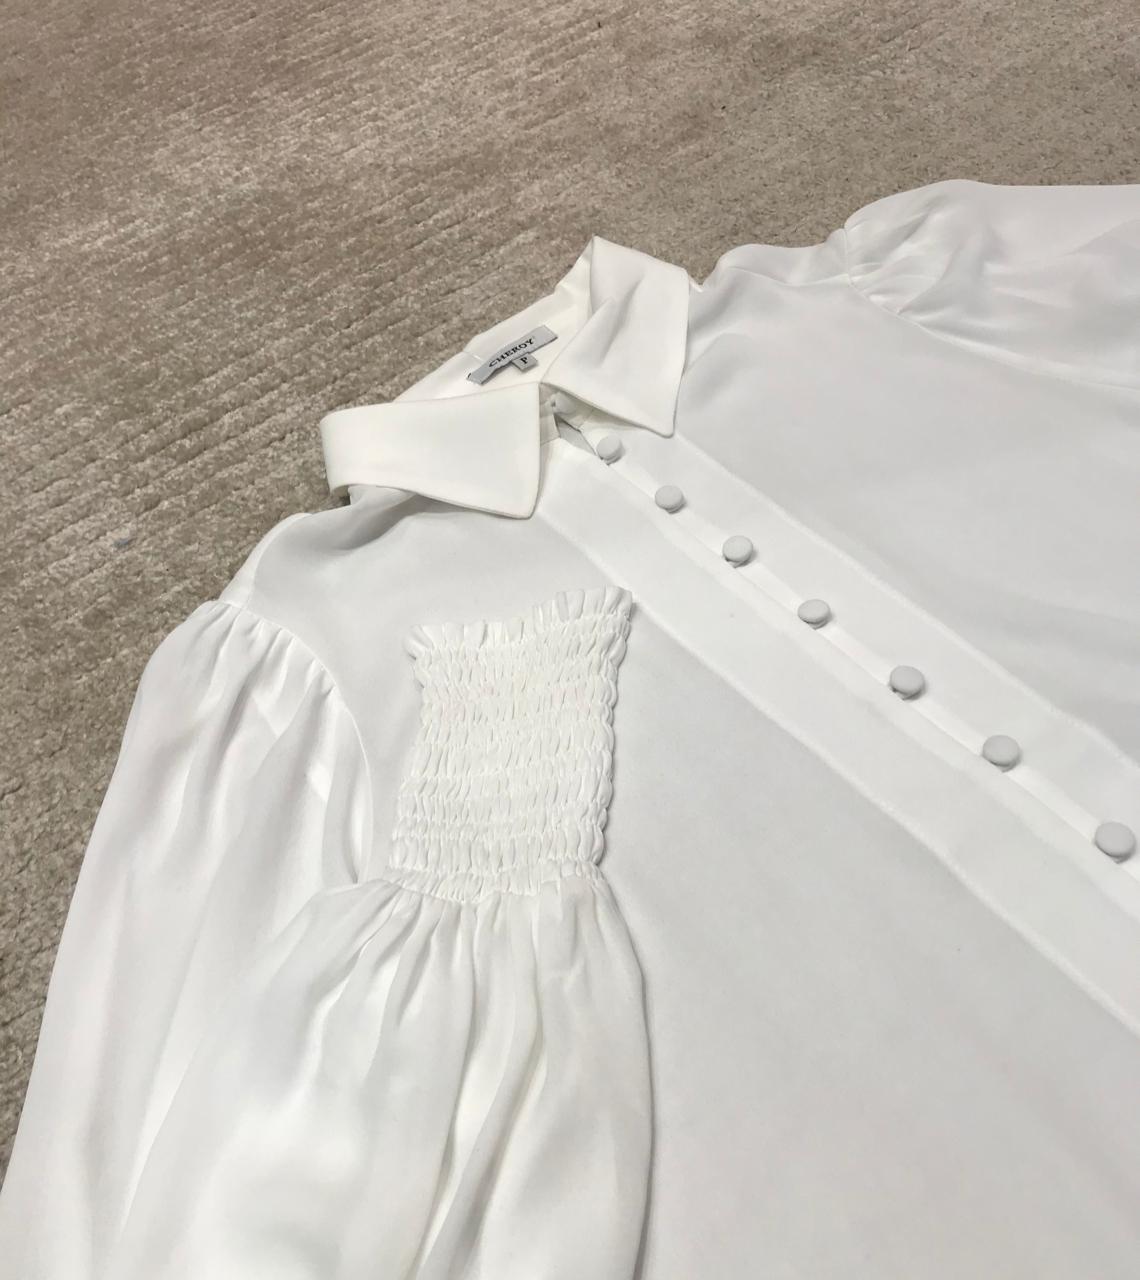 Camisa Chiffon Punho Lastex